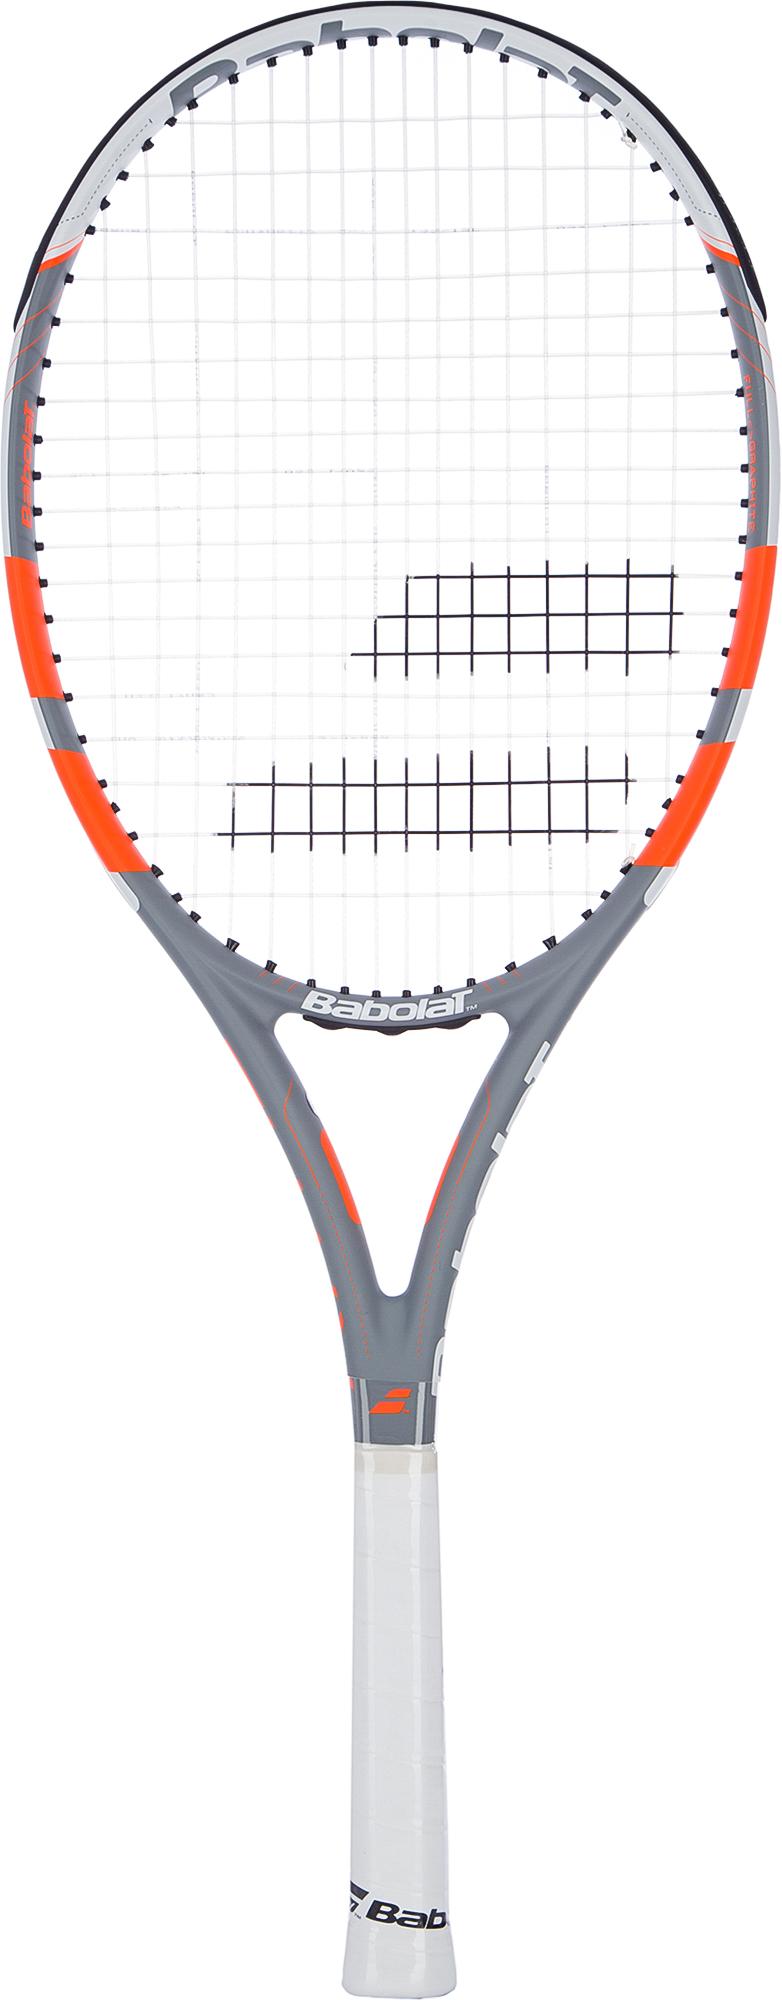 Babolat Ракетка для большого тенниса Babolat RIVAL 100 babolat ракетка для большого тенниса детская babolat ballfighter 23